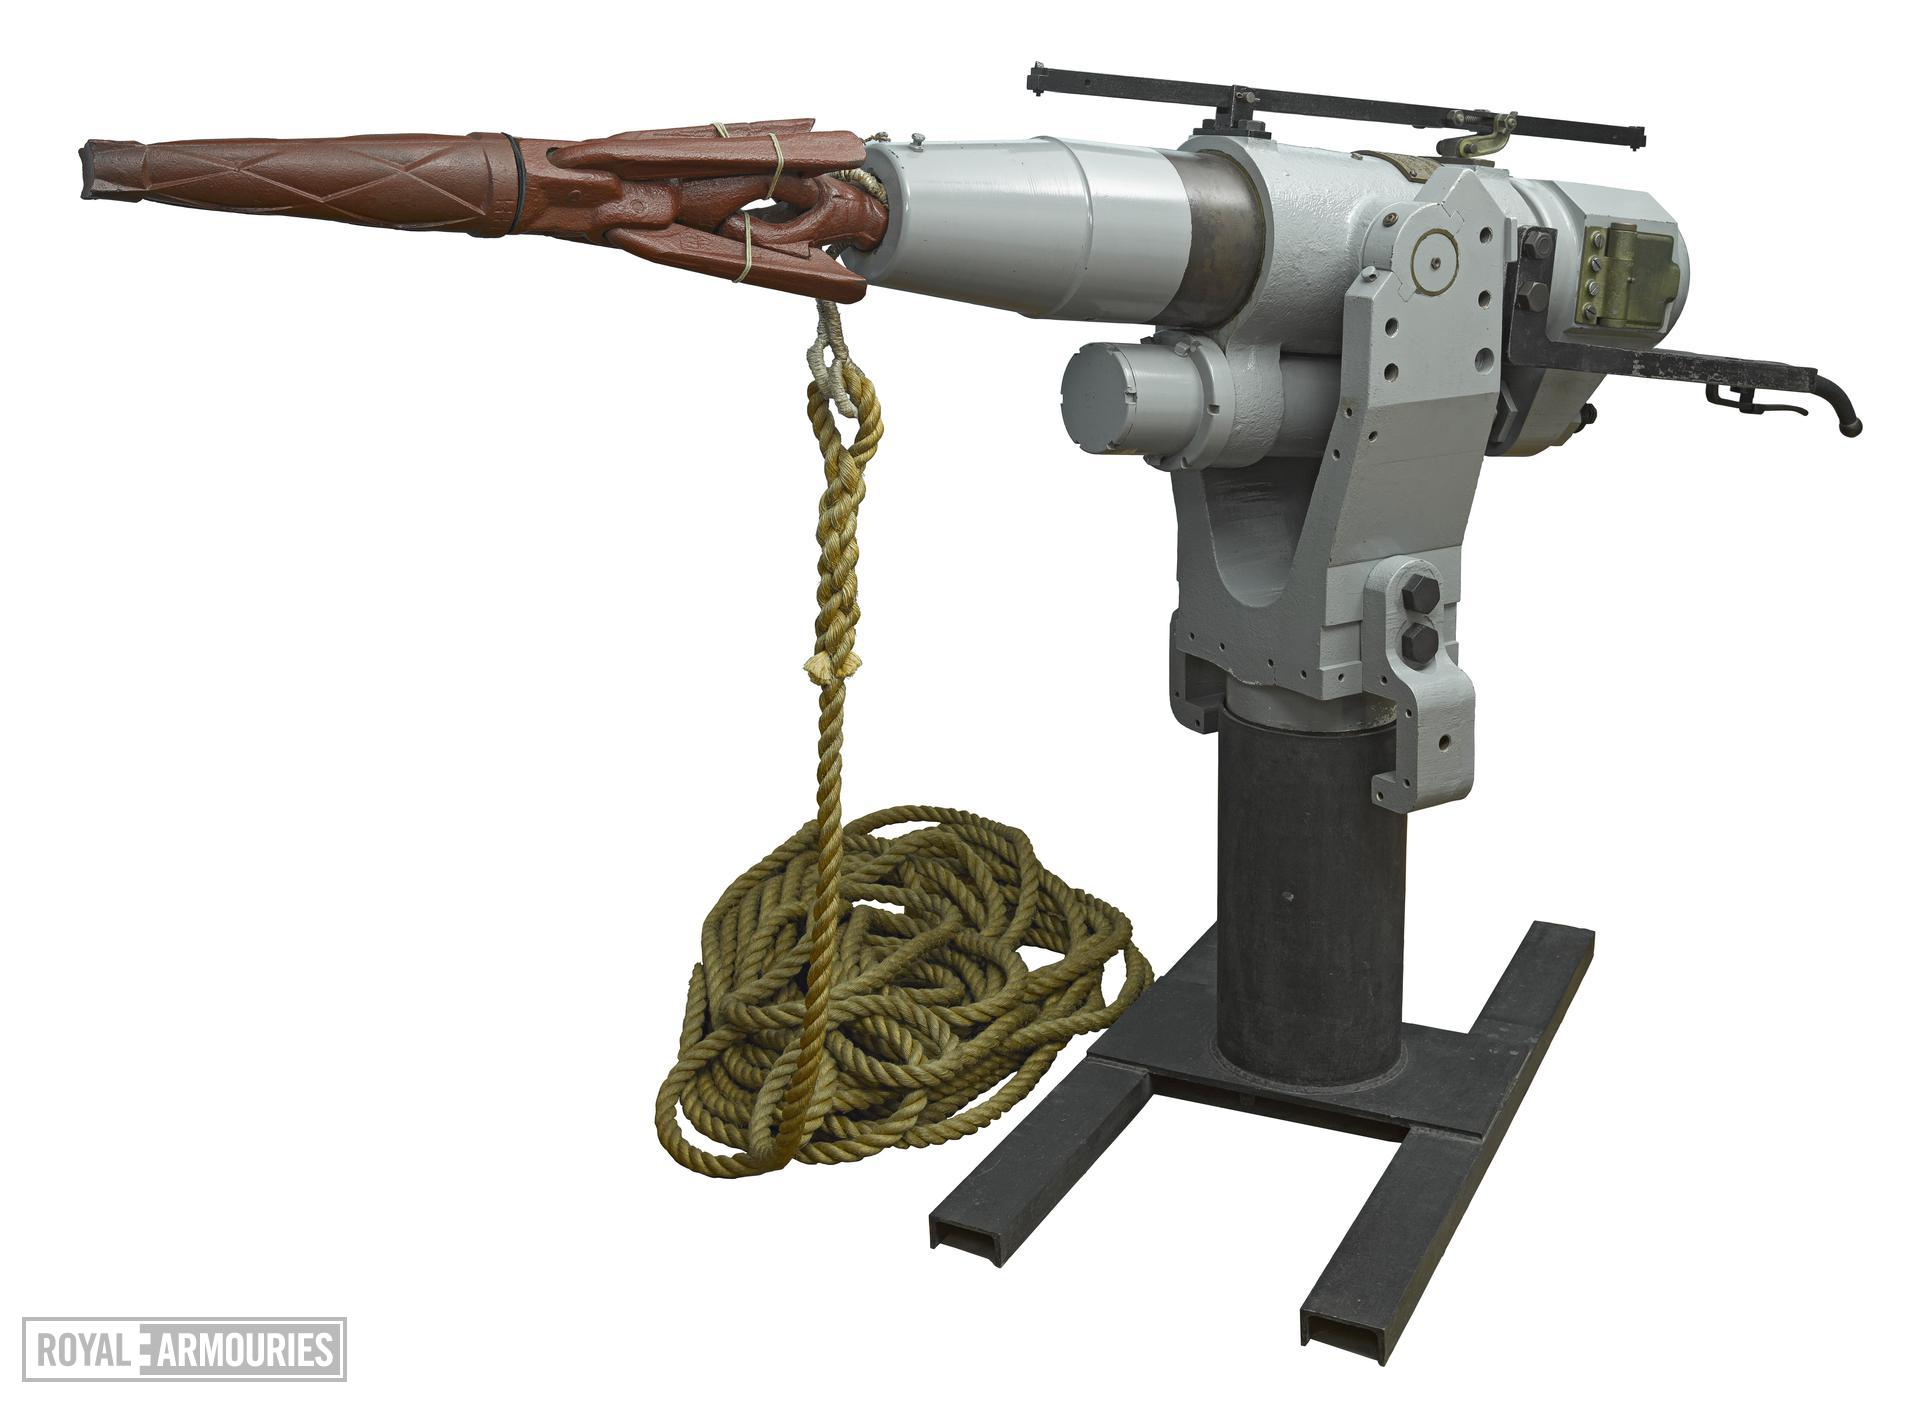 Gun - Whaling or Harpoon gun